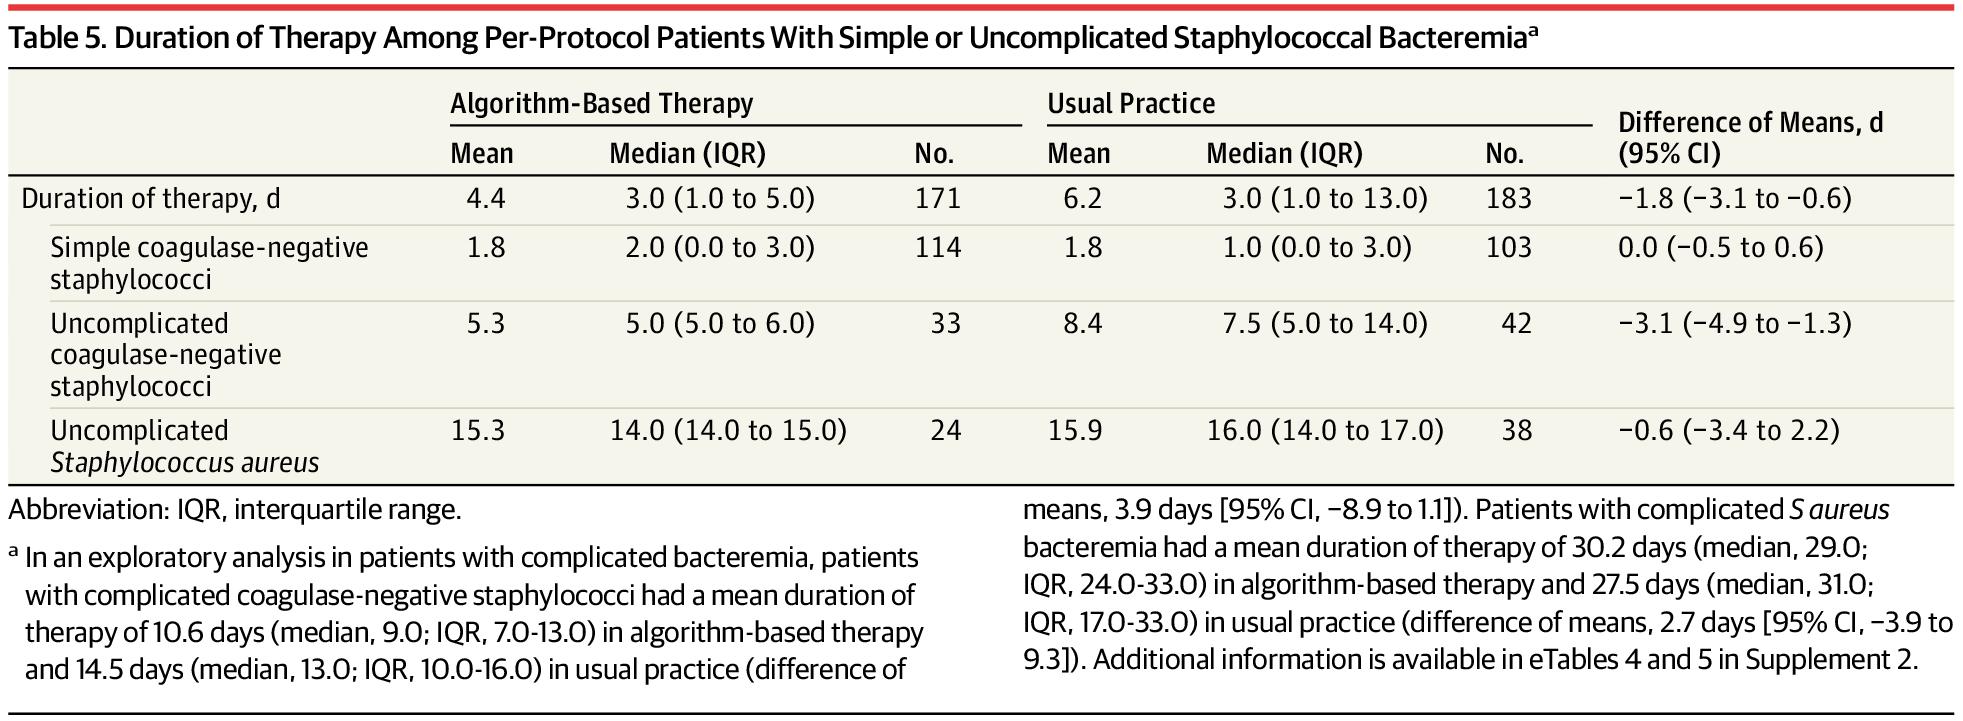 [JAMA最新论文]:基于方案治疗与常规治疗金黄色葡萄球菌菌血症的临床疗效与严重不良事件